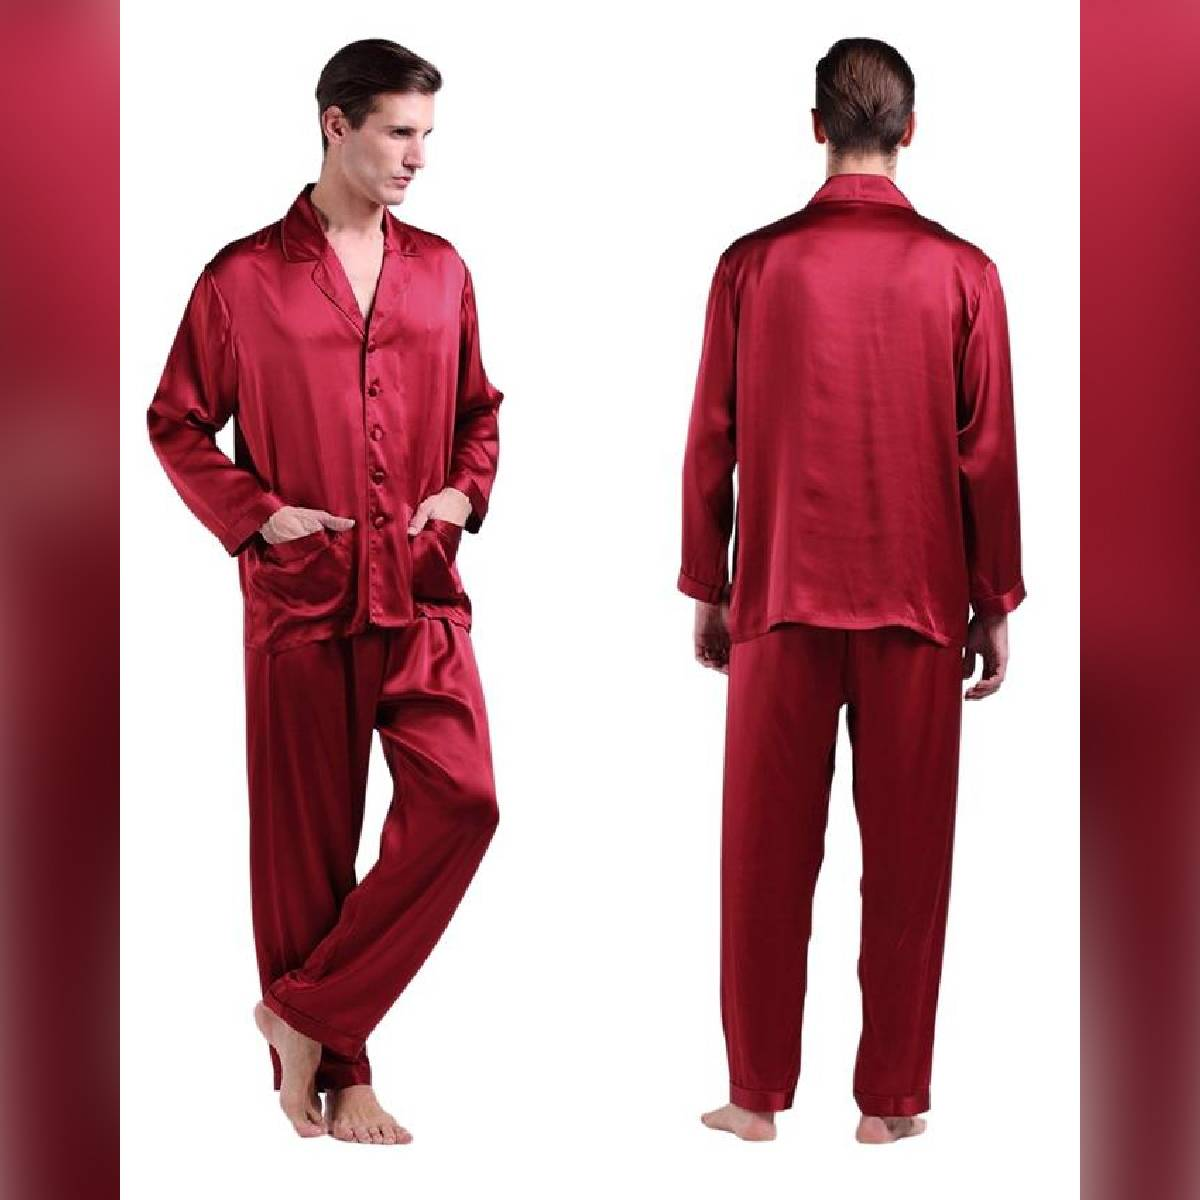 Sebastian silky comfy satin pajama set comfy nightwear